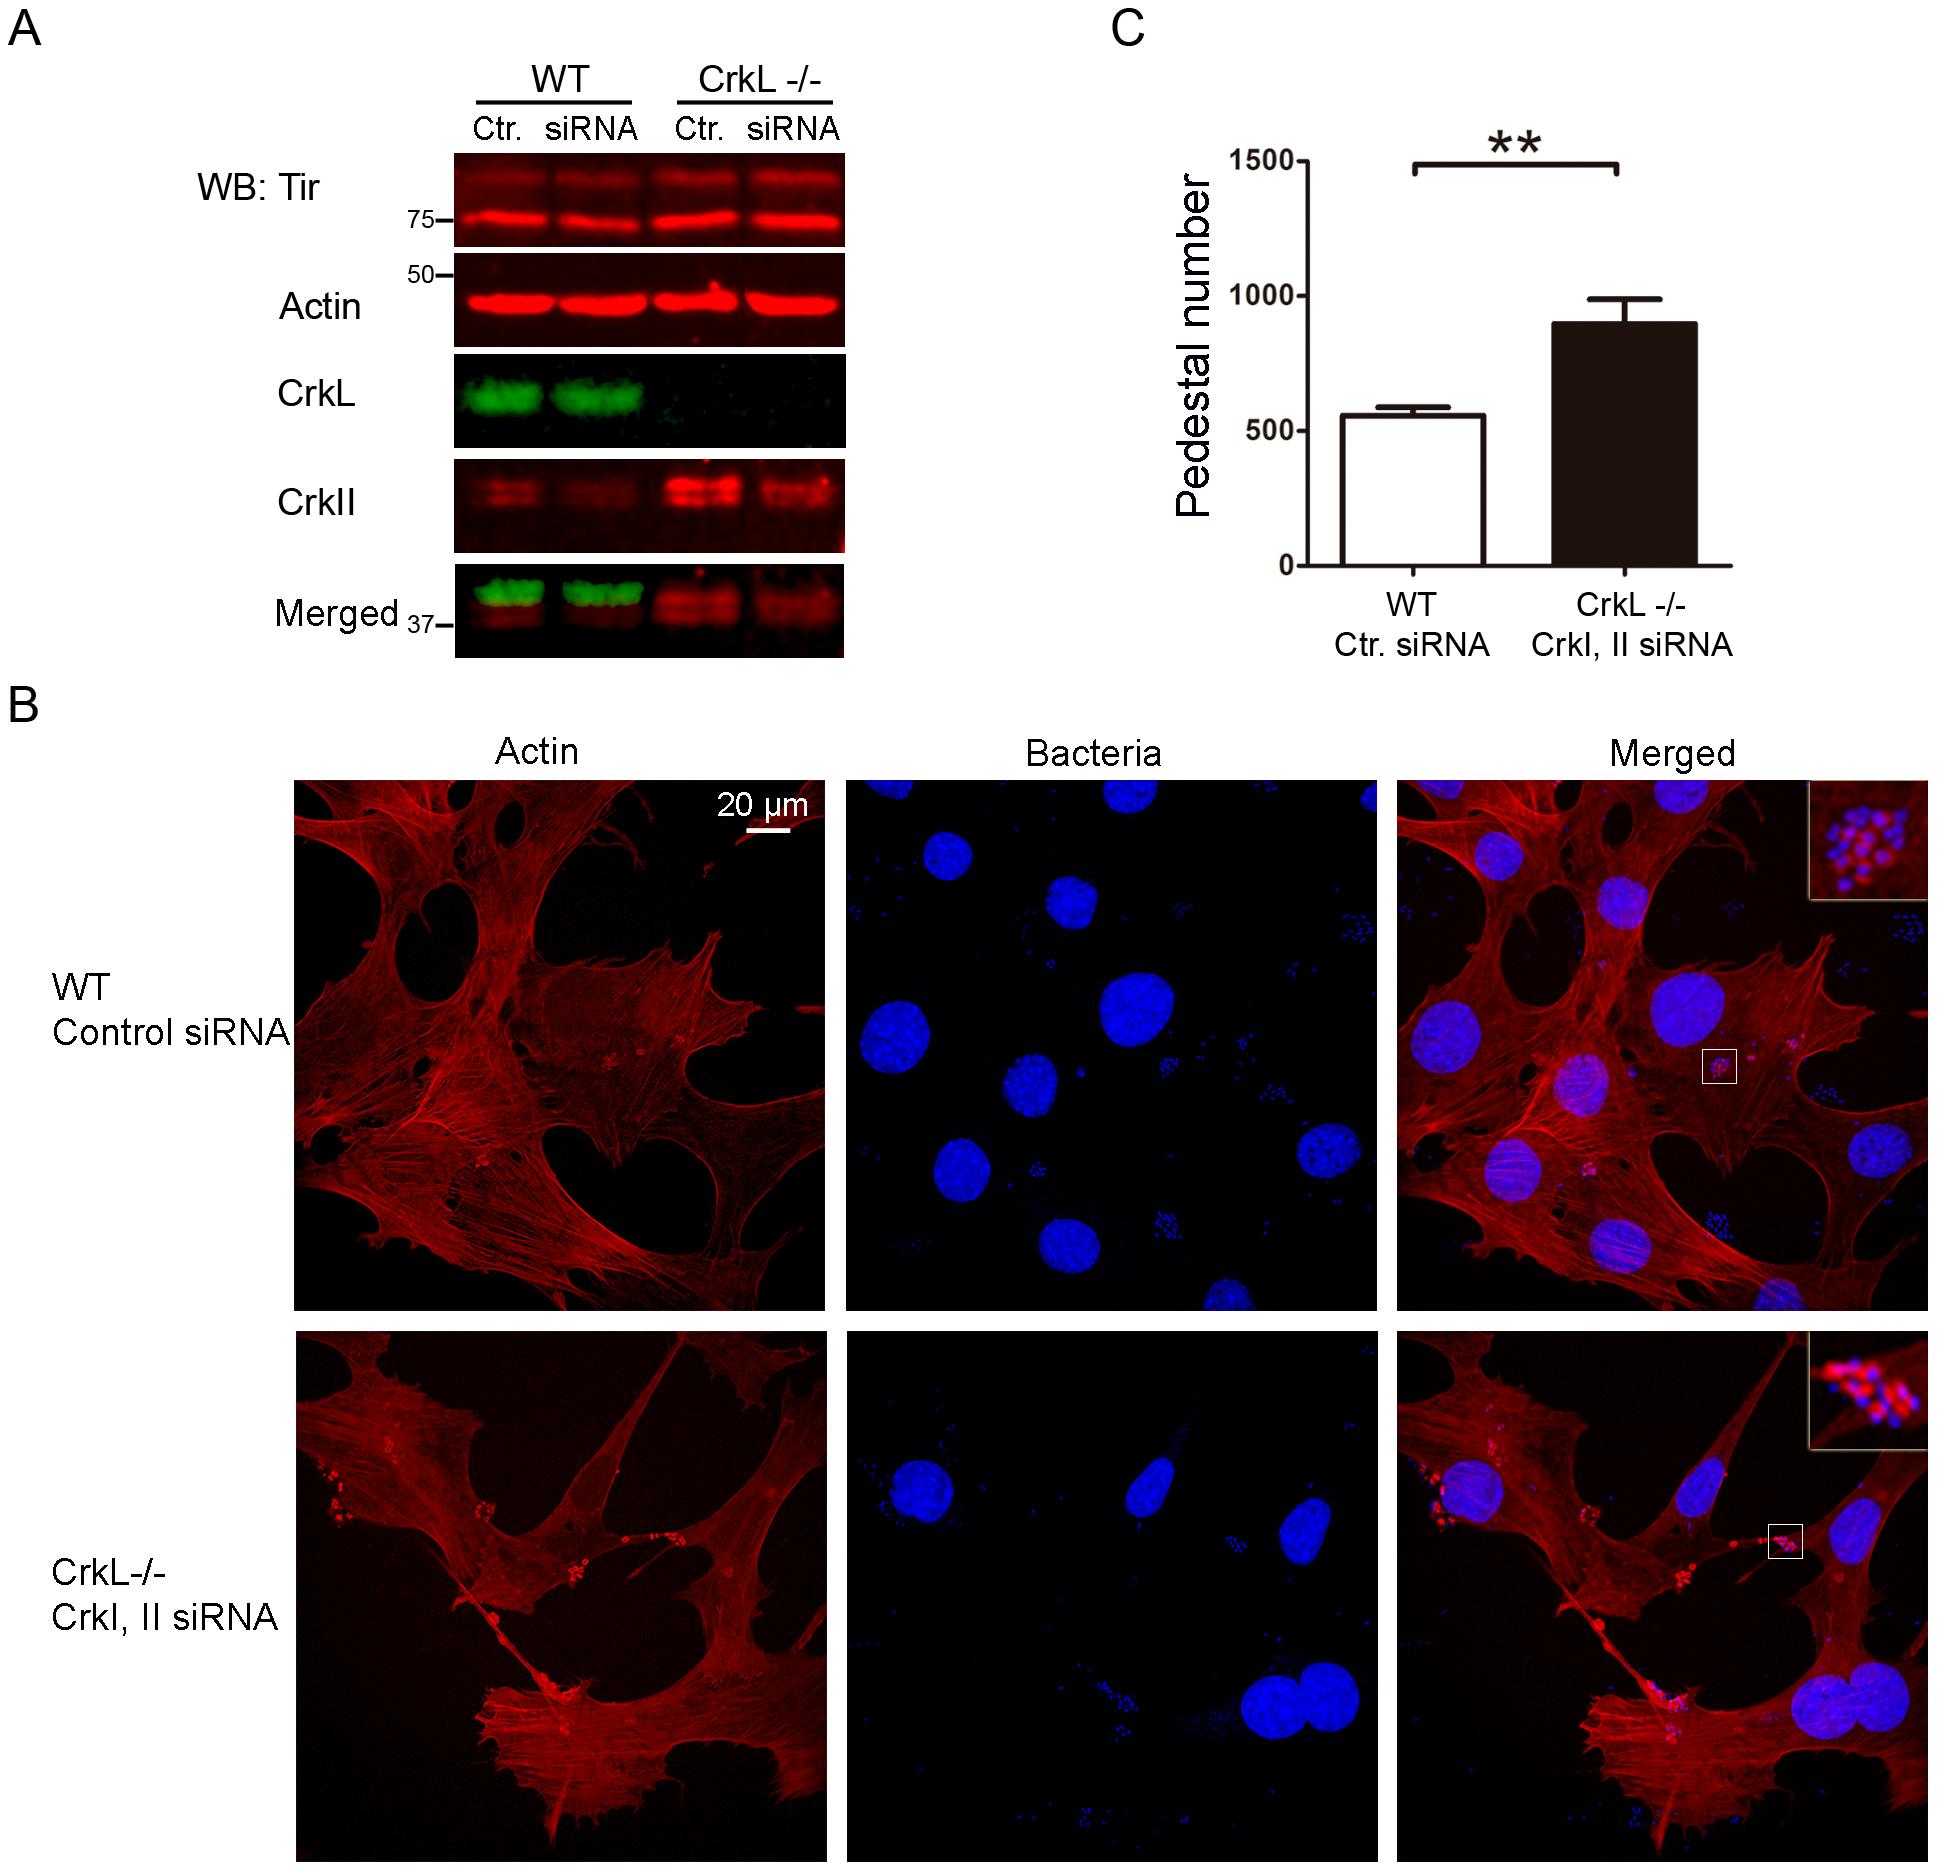 Down-regulation of CrkI/II expression by siRNA in CrkL-deficient MEFs enhances pedestal formation.